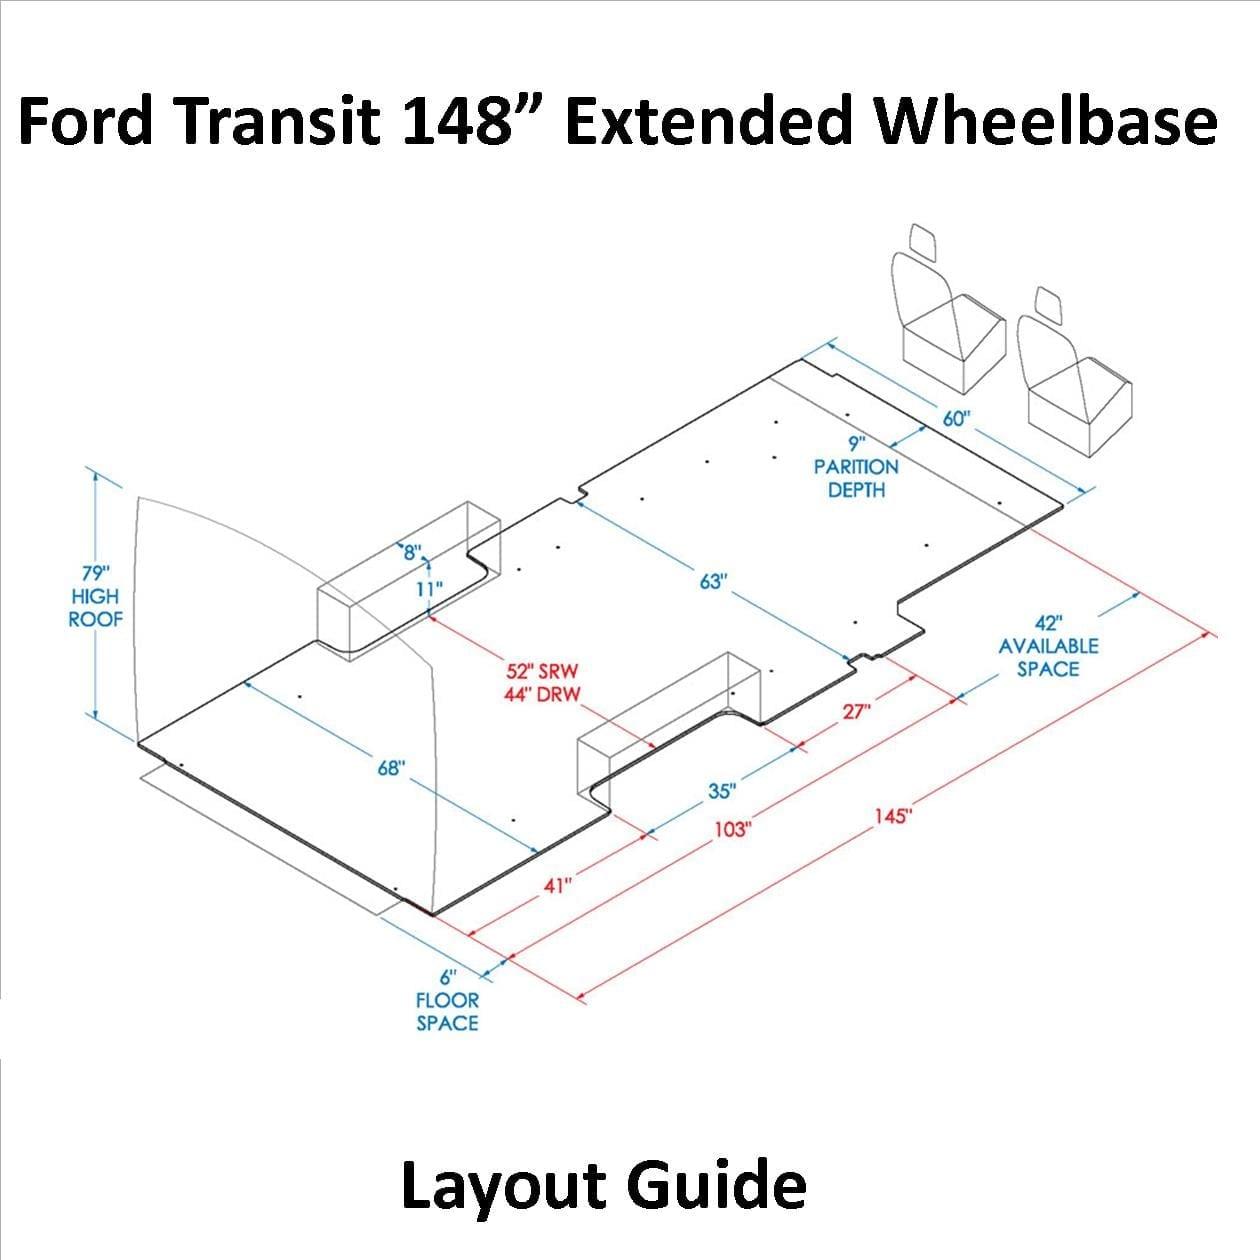 Ford Transit 148